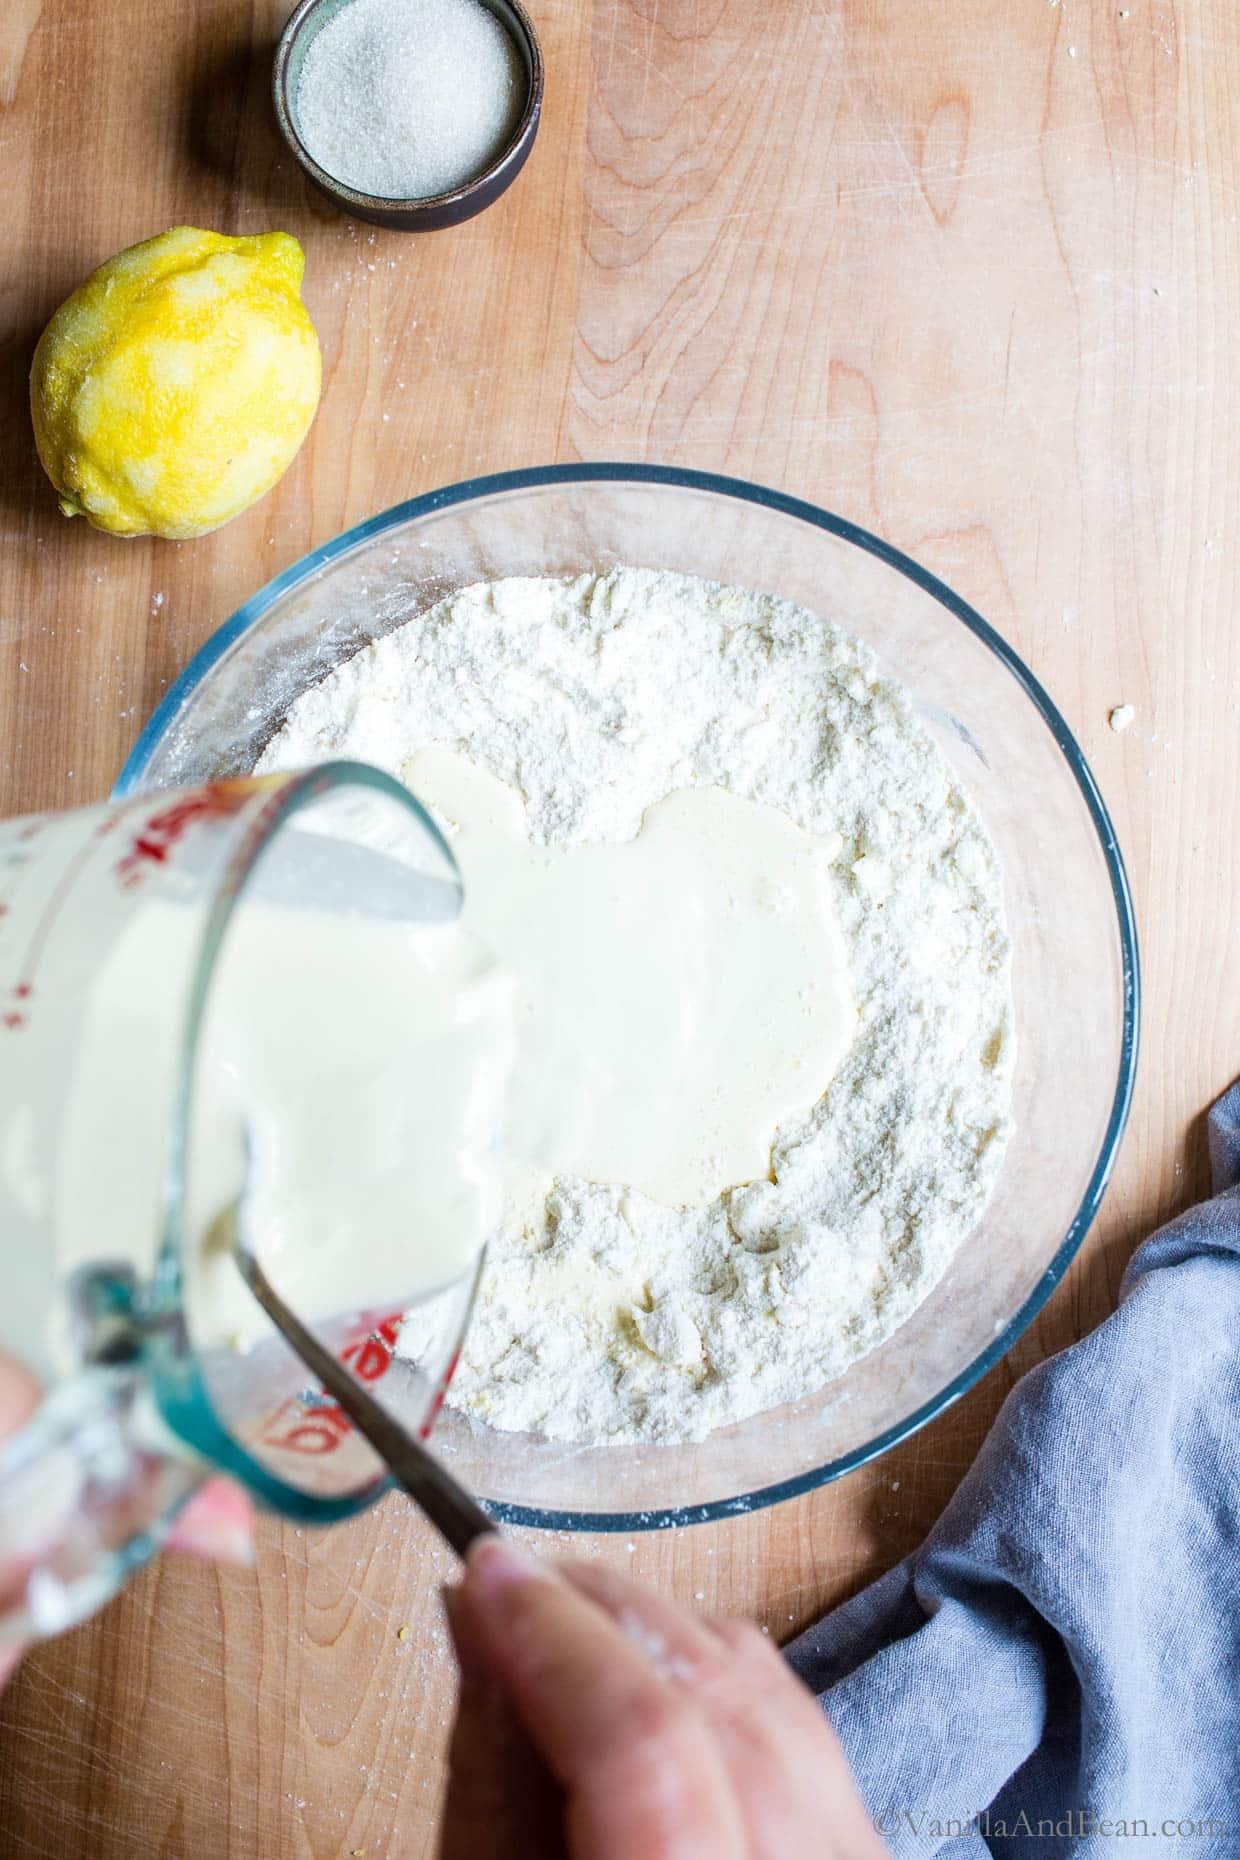 Adding a mix of cream and sourdough into the flour.